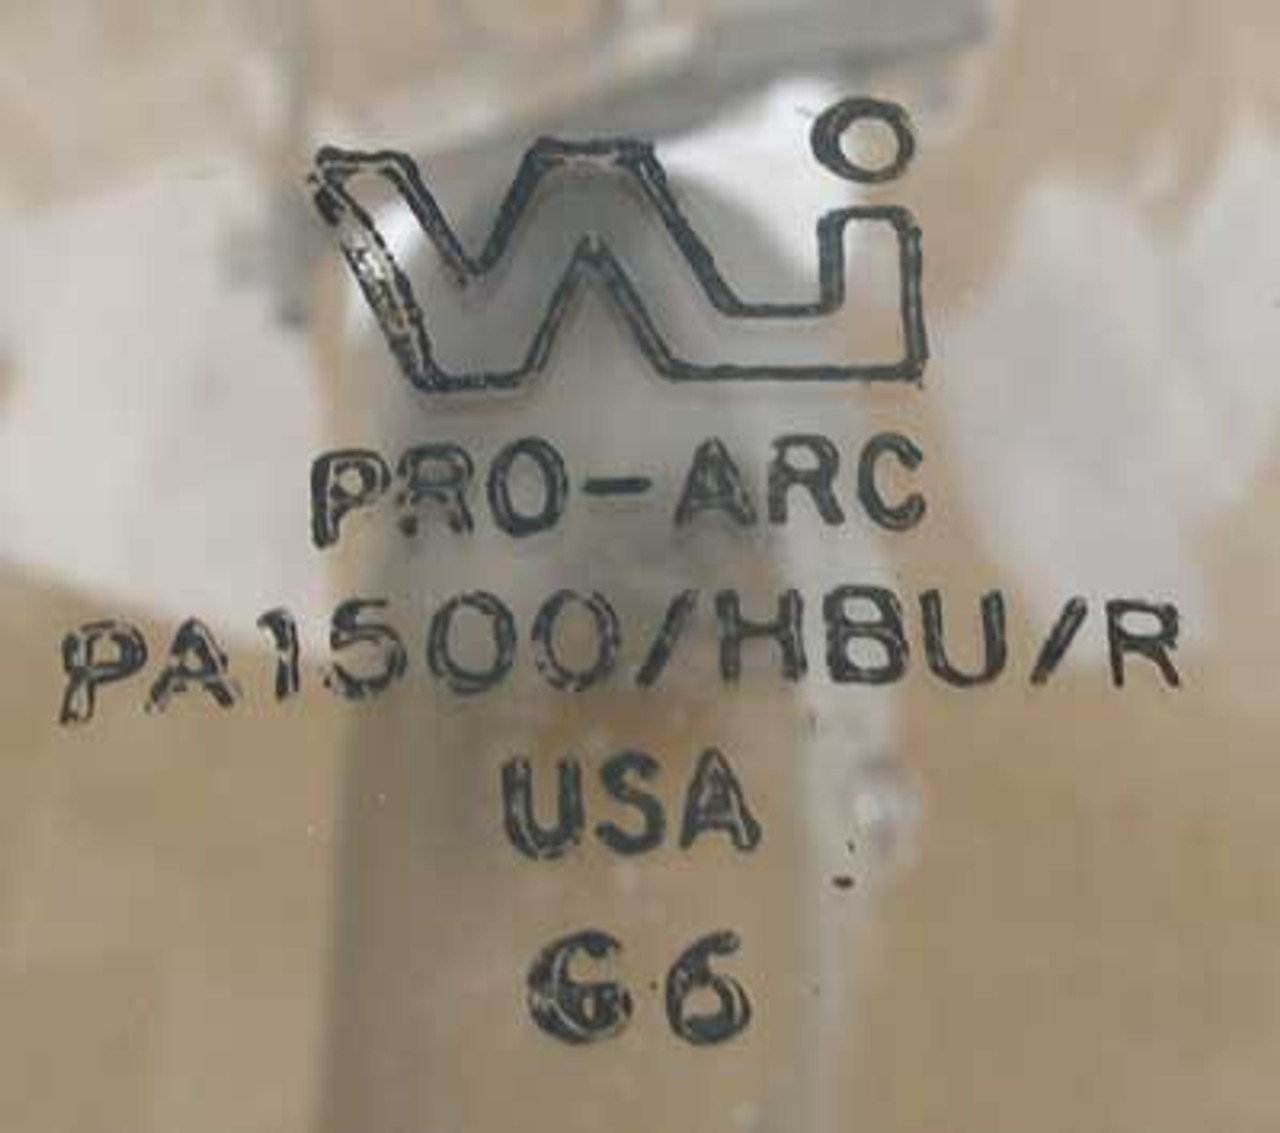 Pro-Arc PA 1500/HBU/R Metal Halide Lamp - New